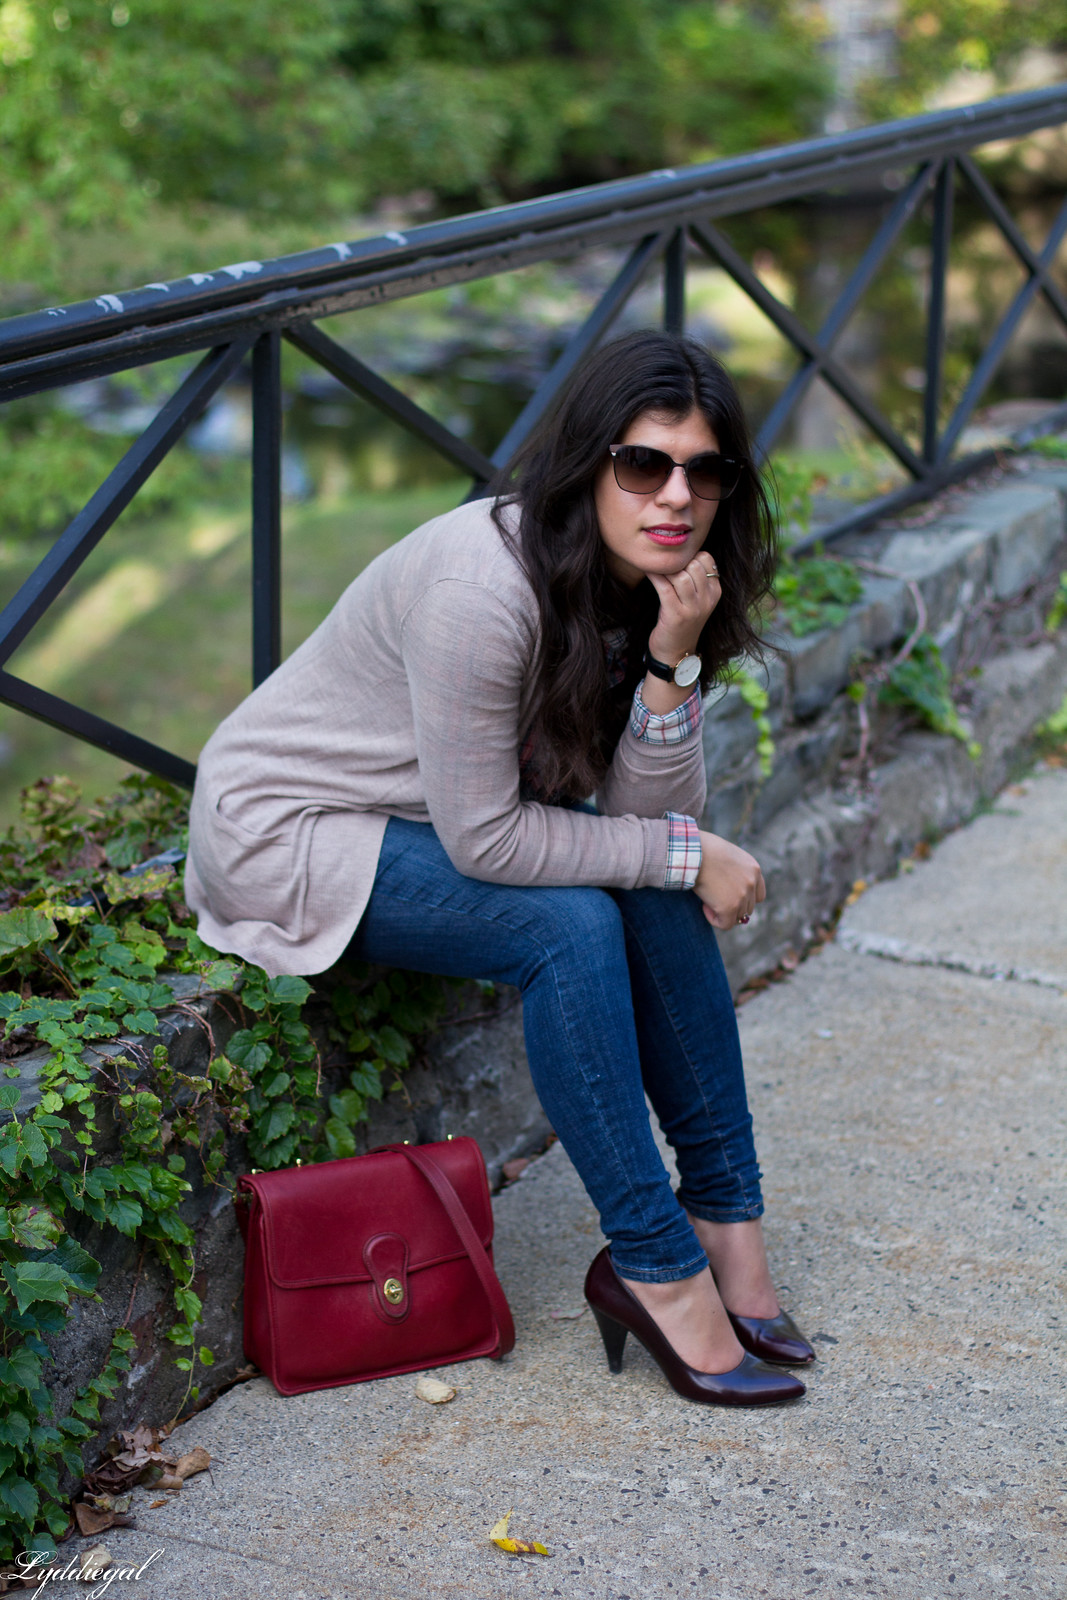 plaid shirt, camel cardigan, jeans, red coach willis bag-4.jpg